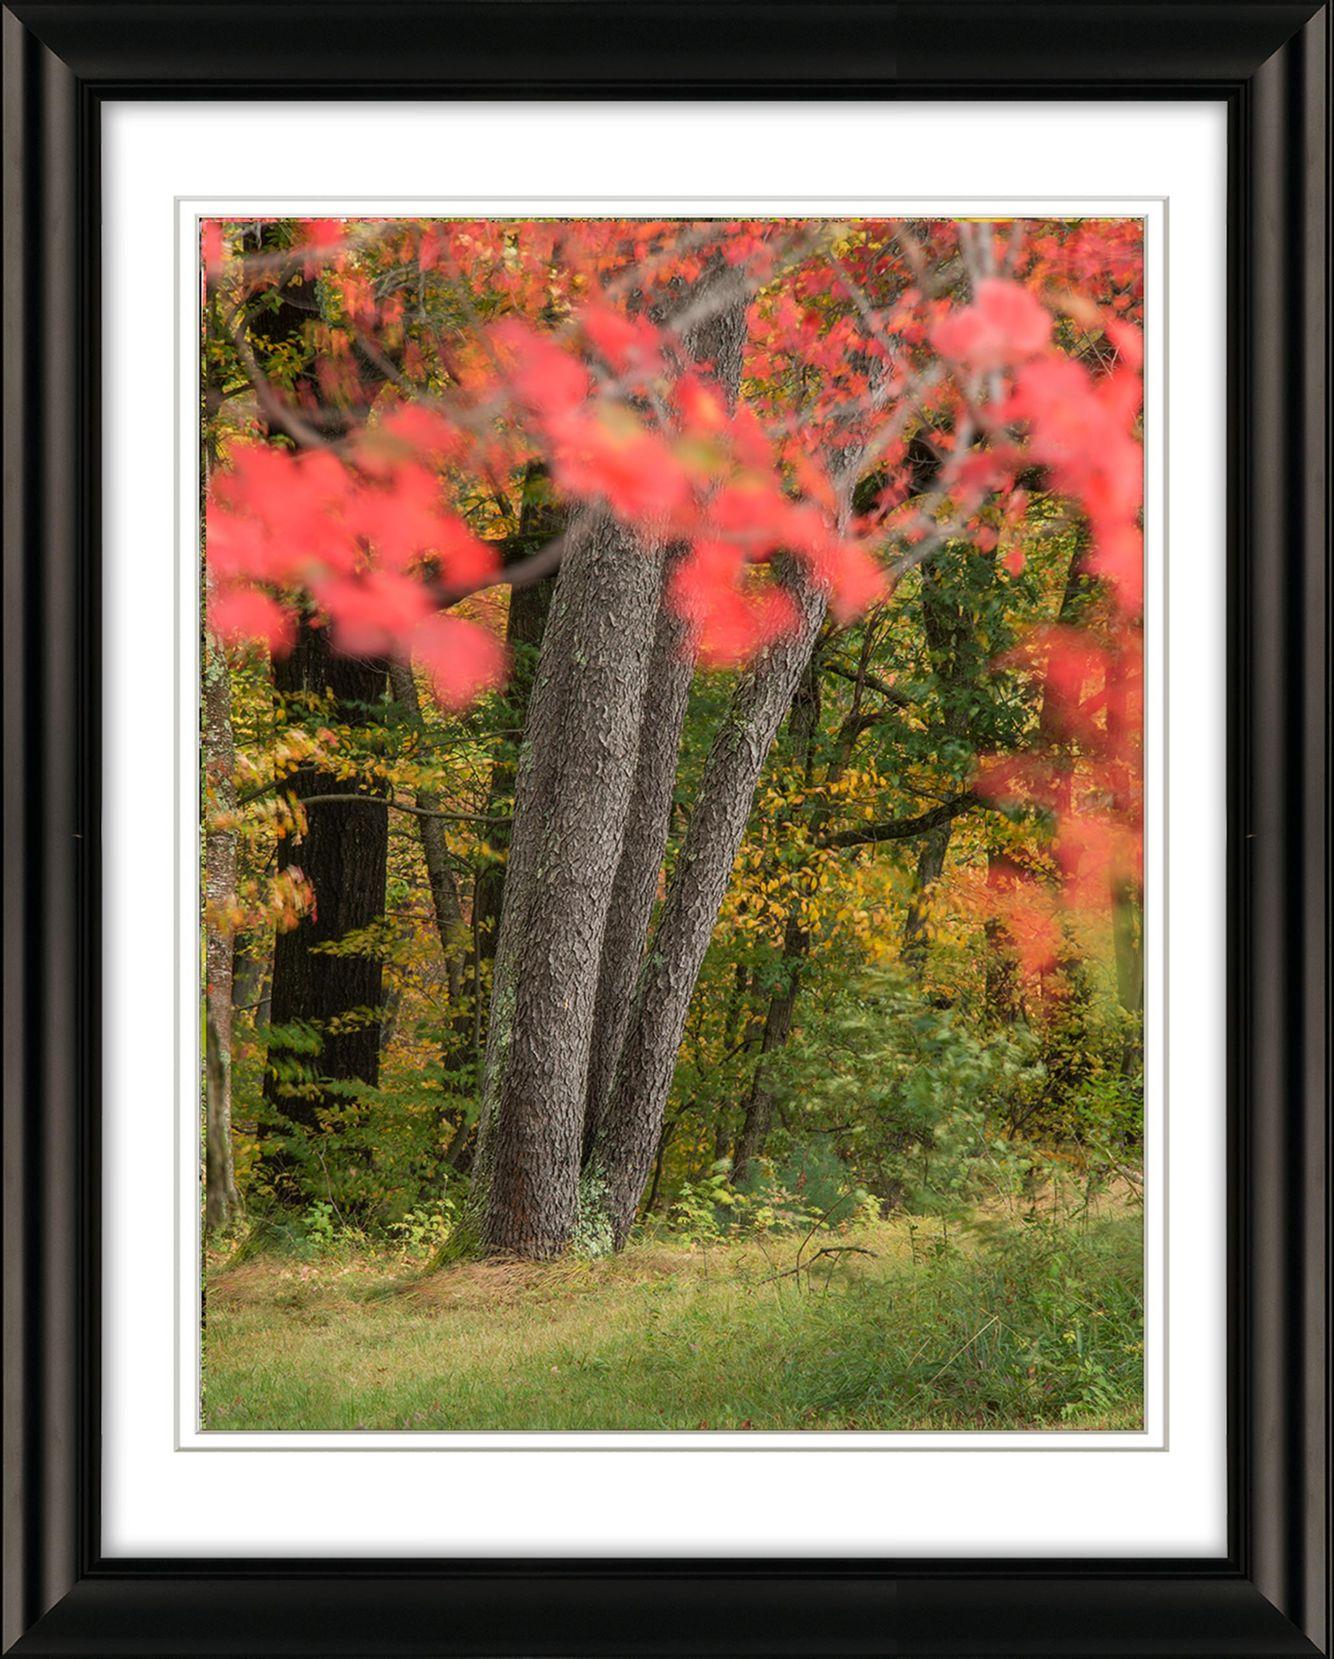 Frame-2993-Red-Leaves-Fall-Groff-Park-Livebooks-Opt.jpg